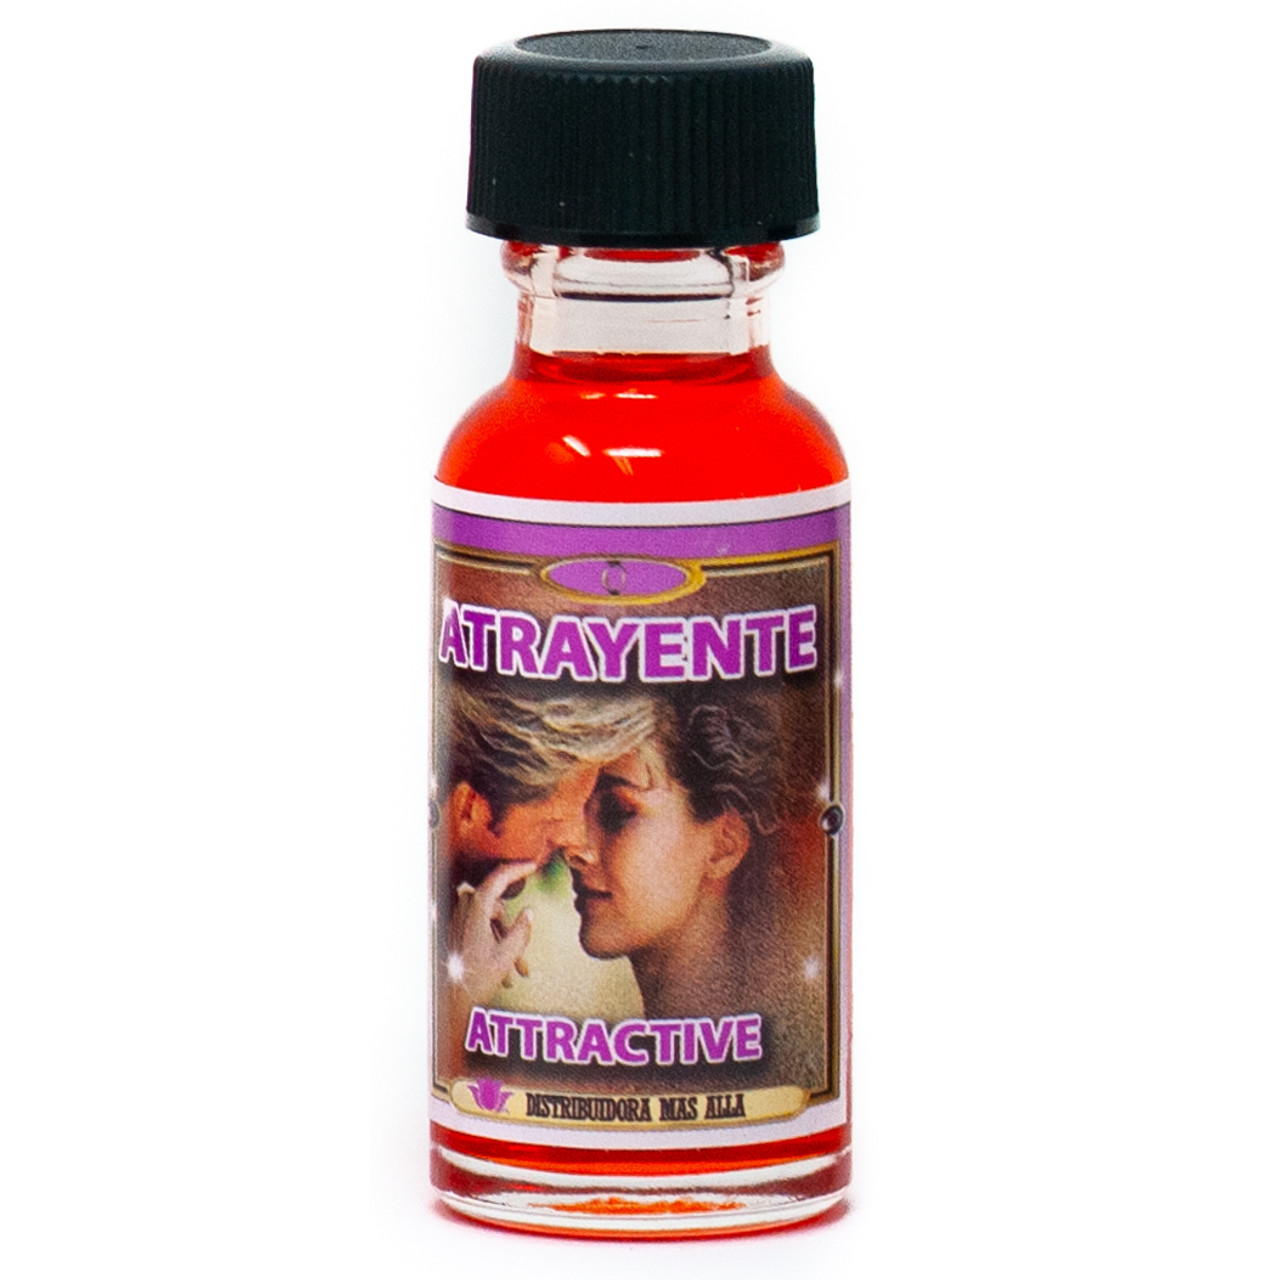 Aceite Atrayente - Attractive Oil